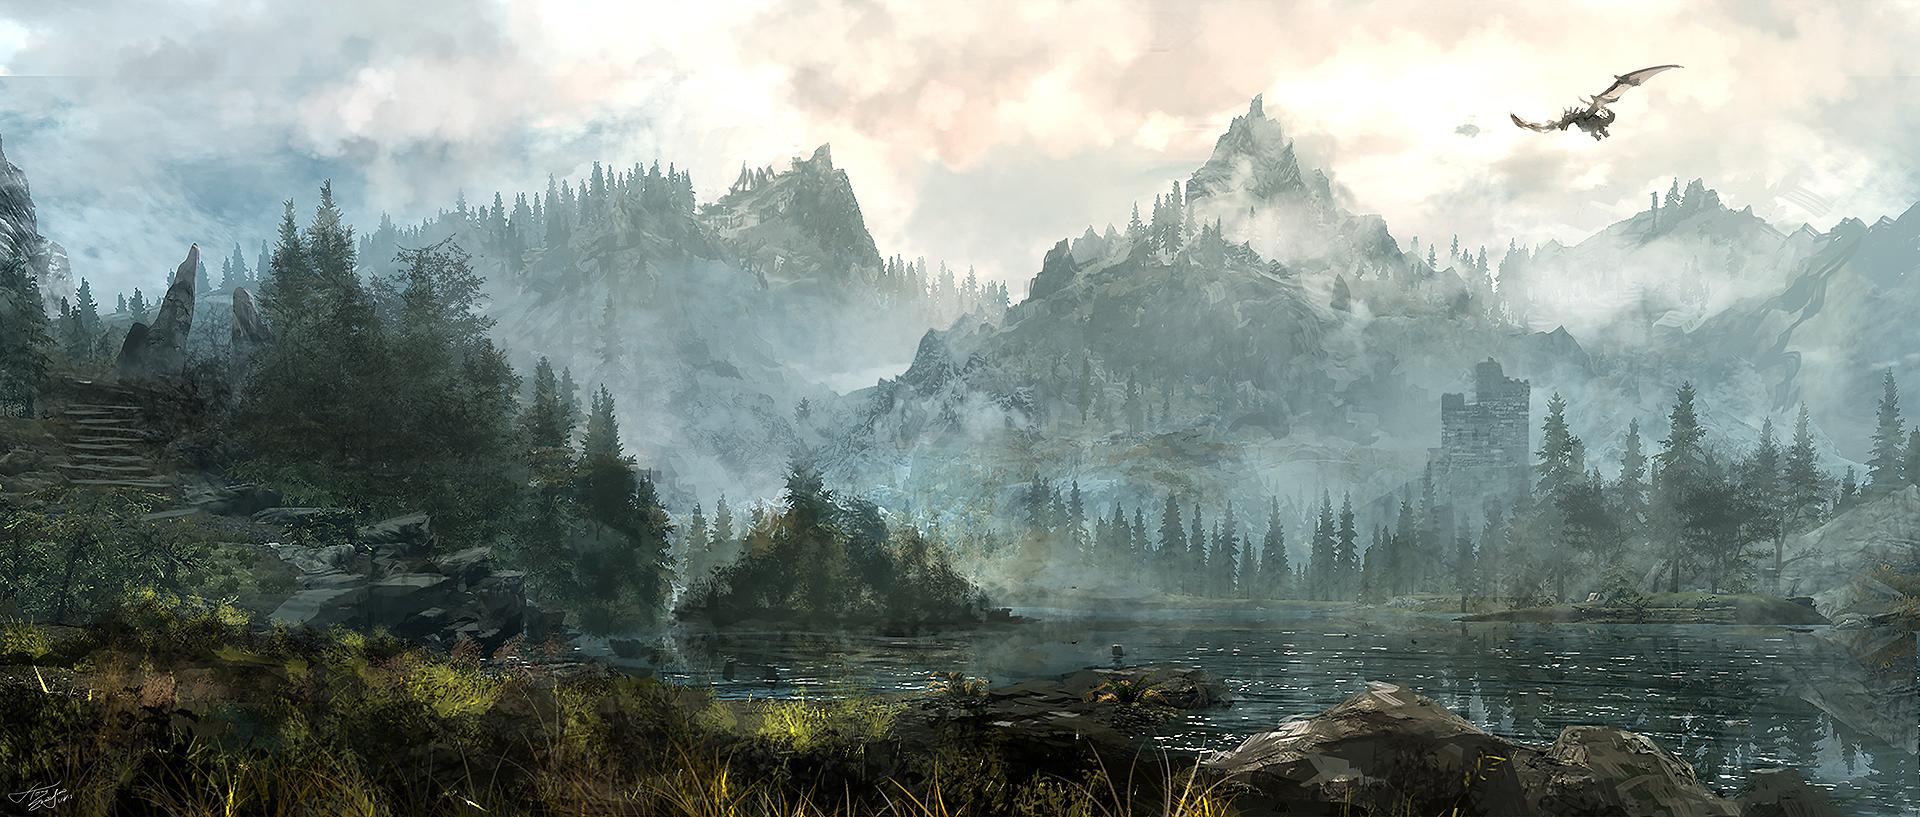 Skyrim landscape by tnounsy